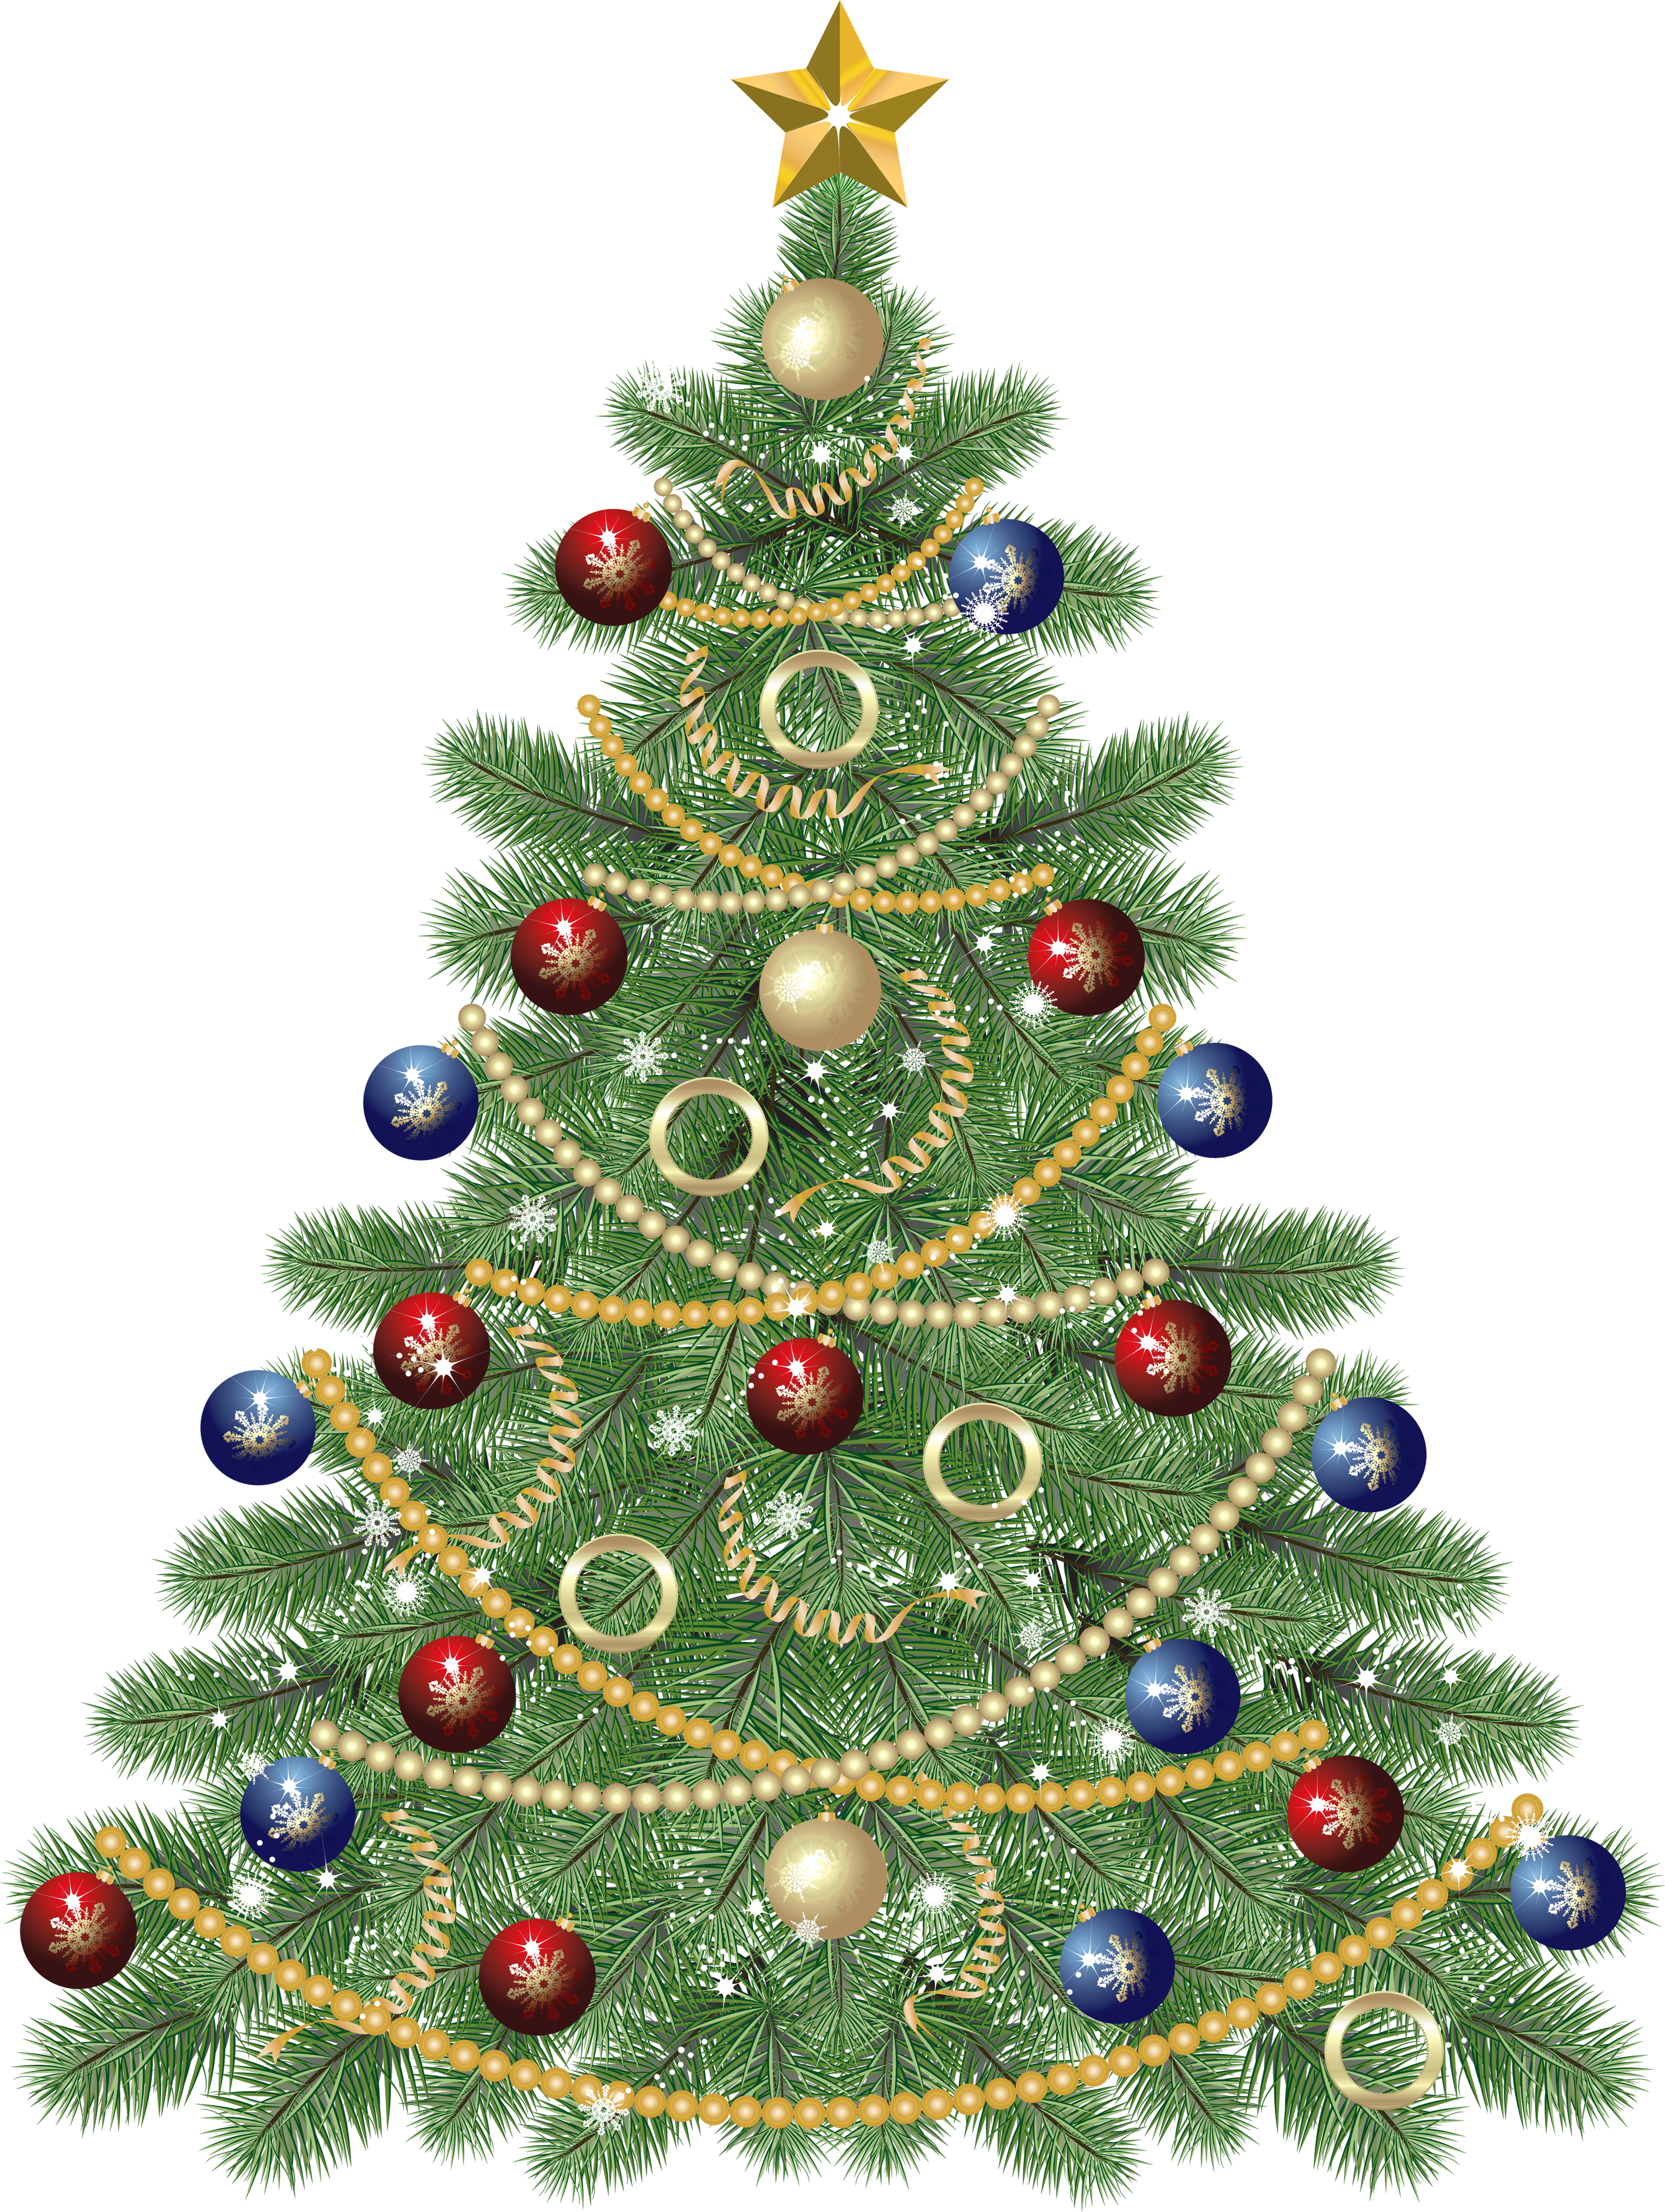 Free christmas tree clipart p - Free Clip Art Christmas Tree